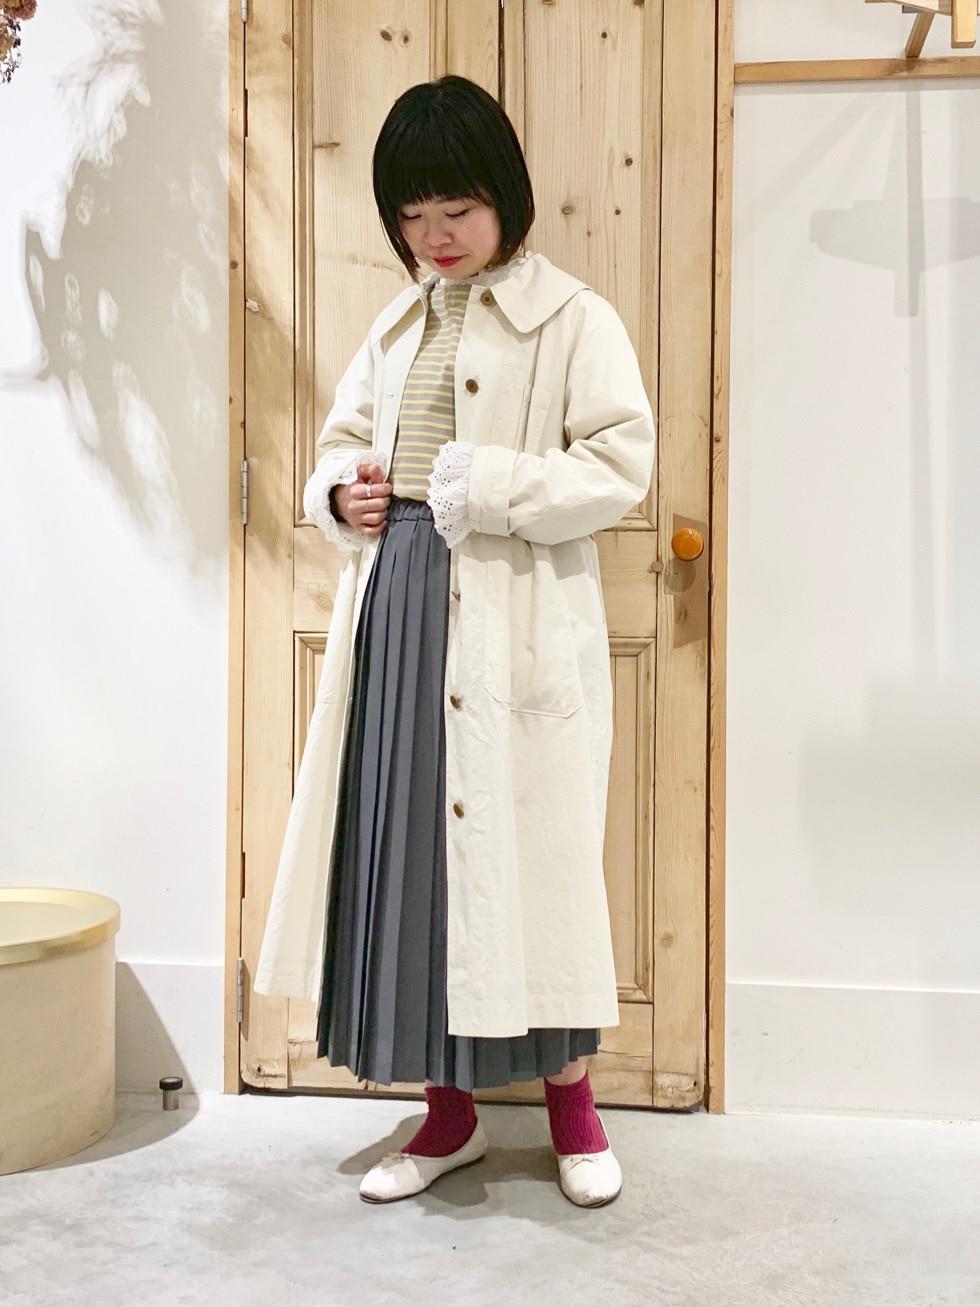 Malle chambre de charme 調布パルコ 身長:153cm 2021.02.12